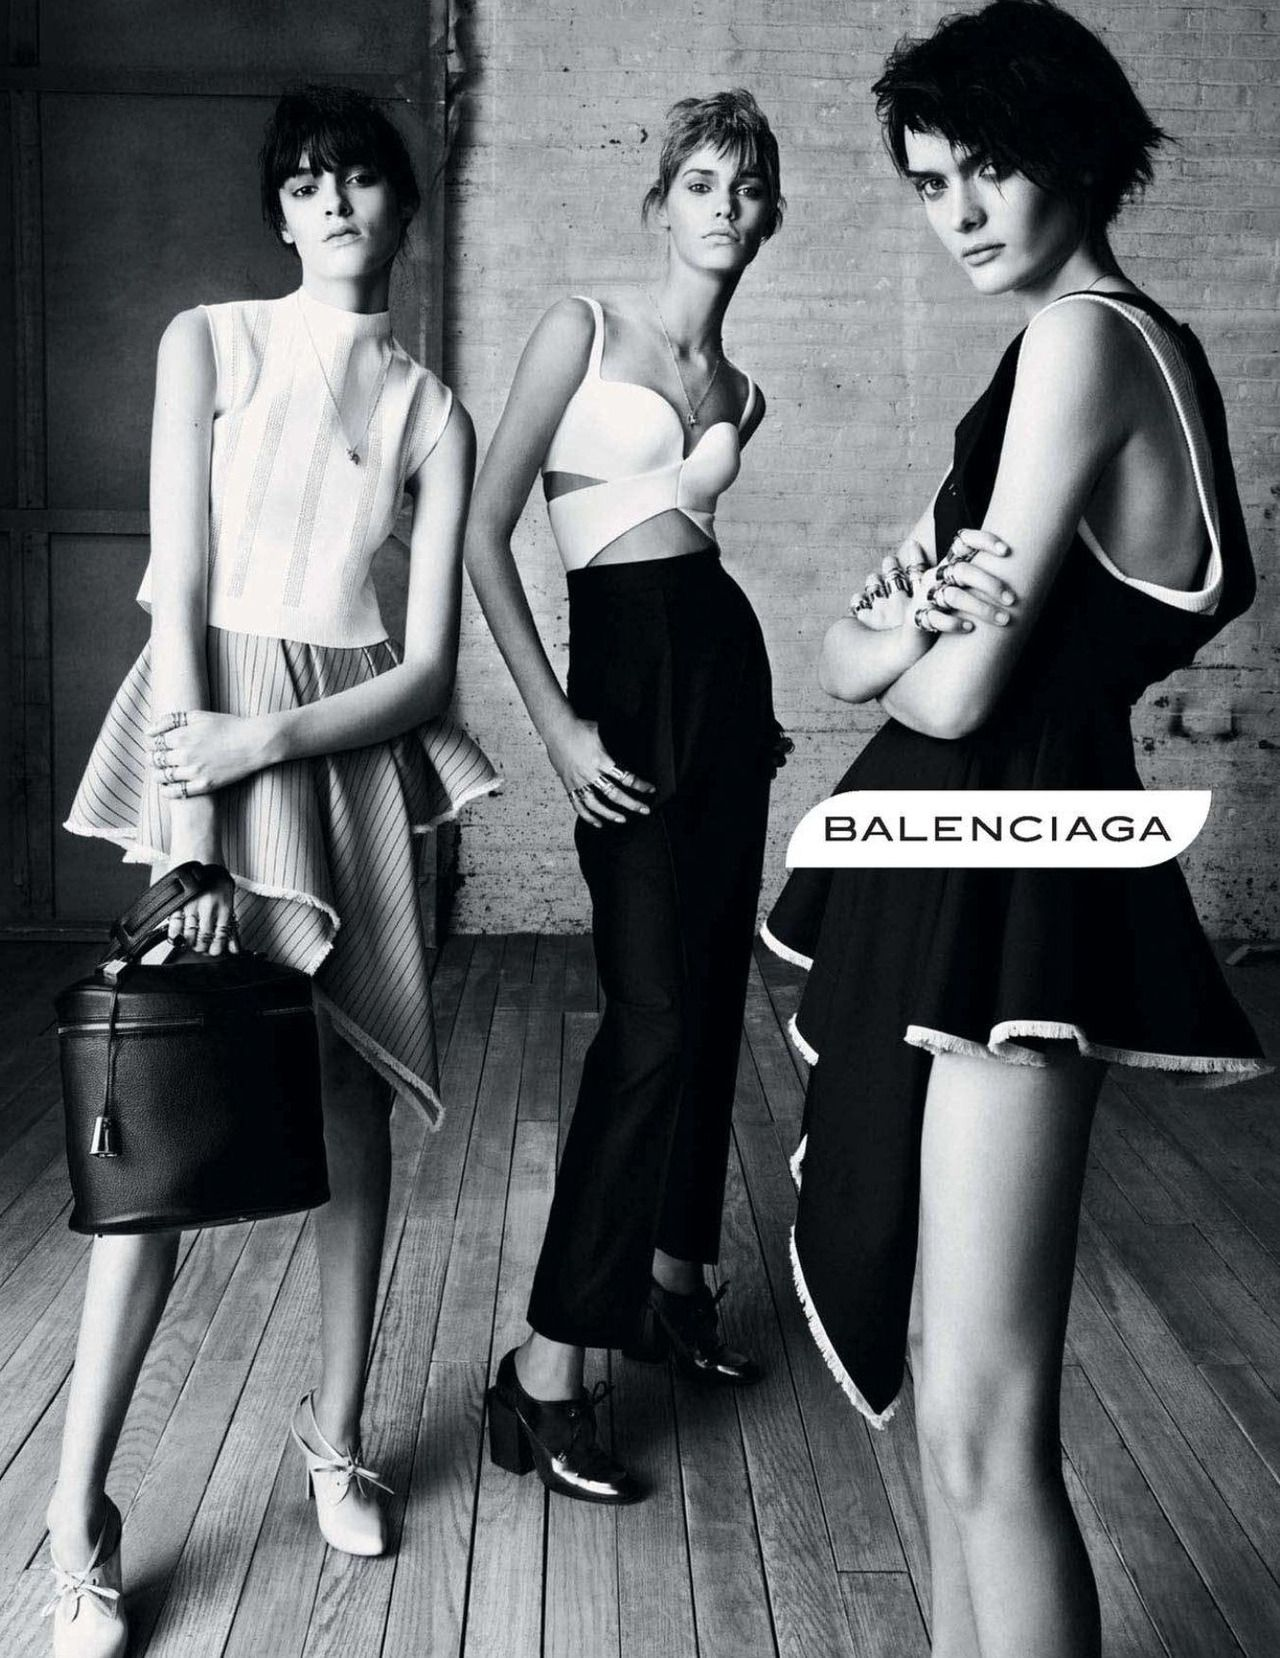 Kremi, Kirstin & Sam by Steven Meisel for Balenciaga Spring/Summer 2013 (Ad Campaign)